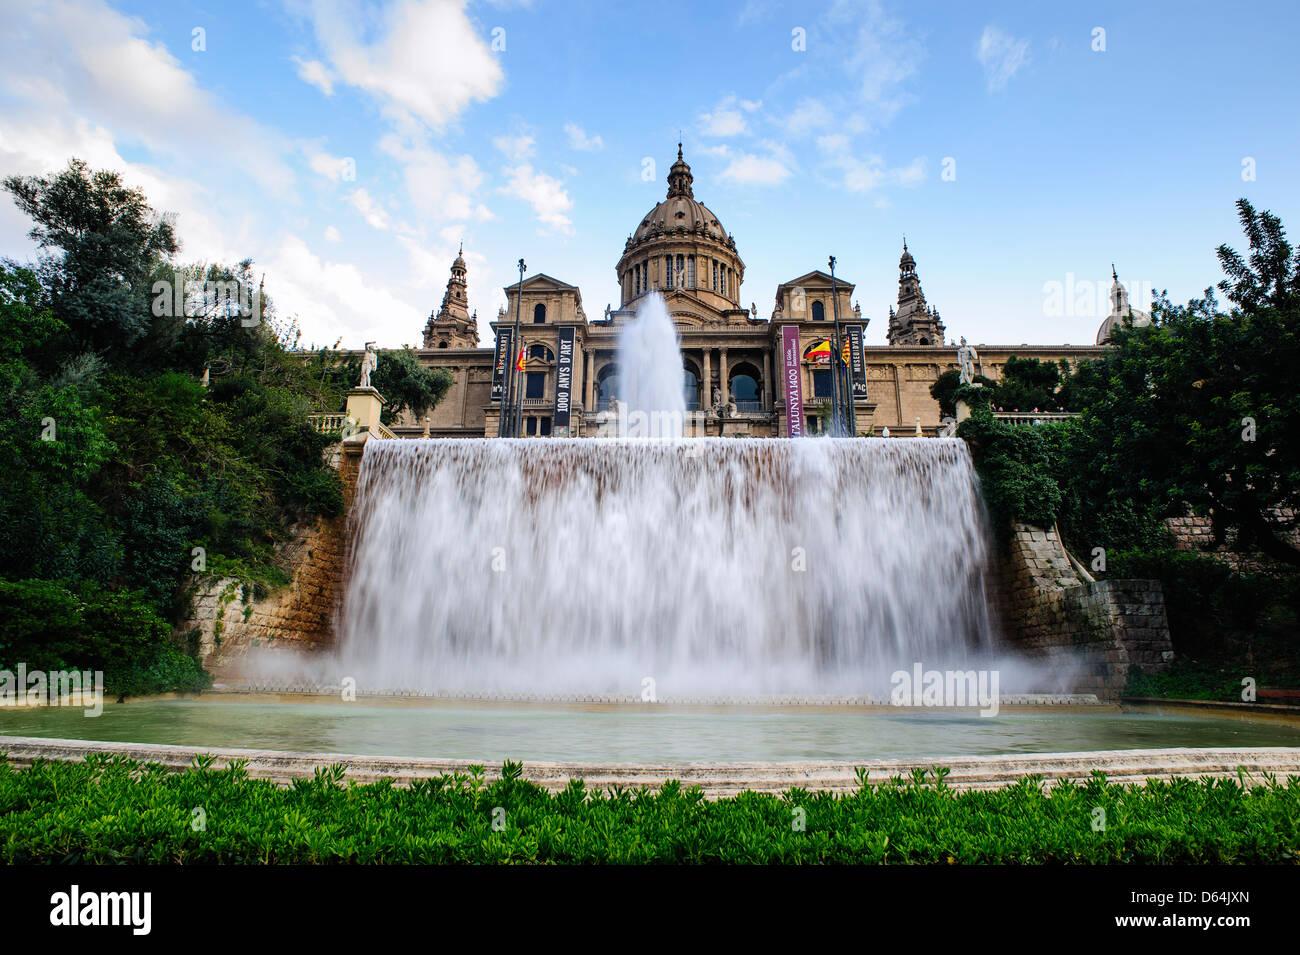 National Museum of Catalonia, Montjuic, Barcelona, Spain. - Stock Image